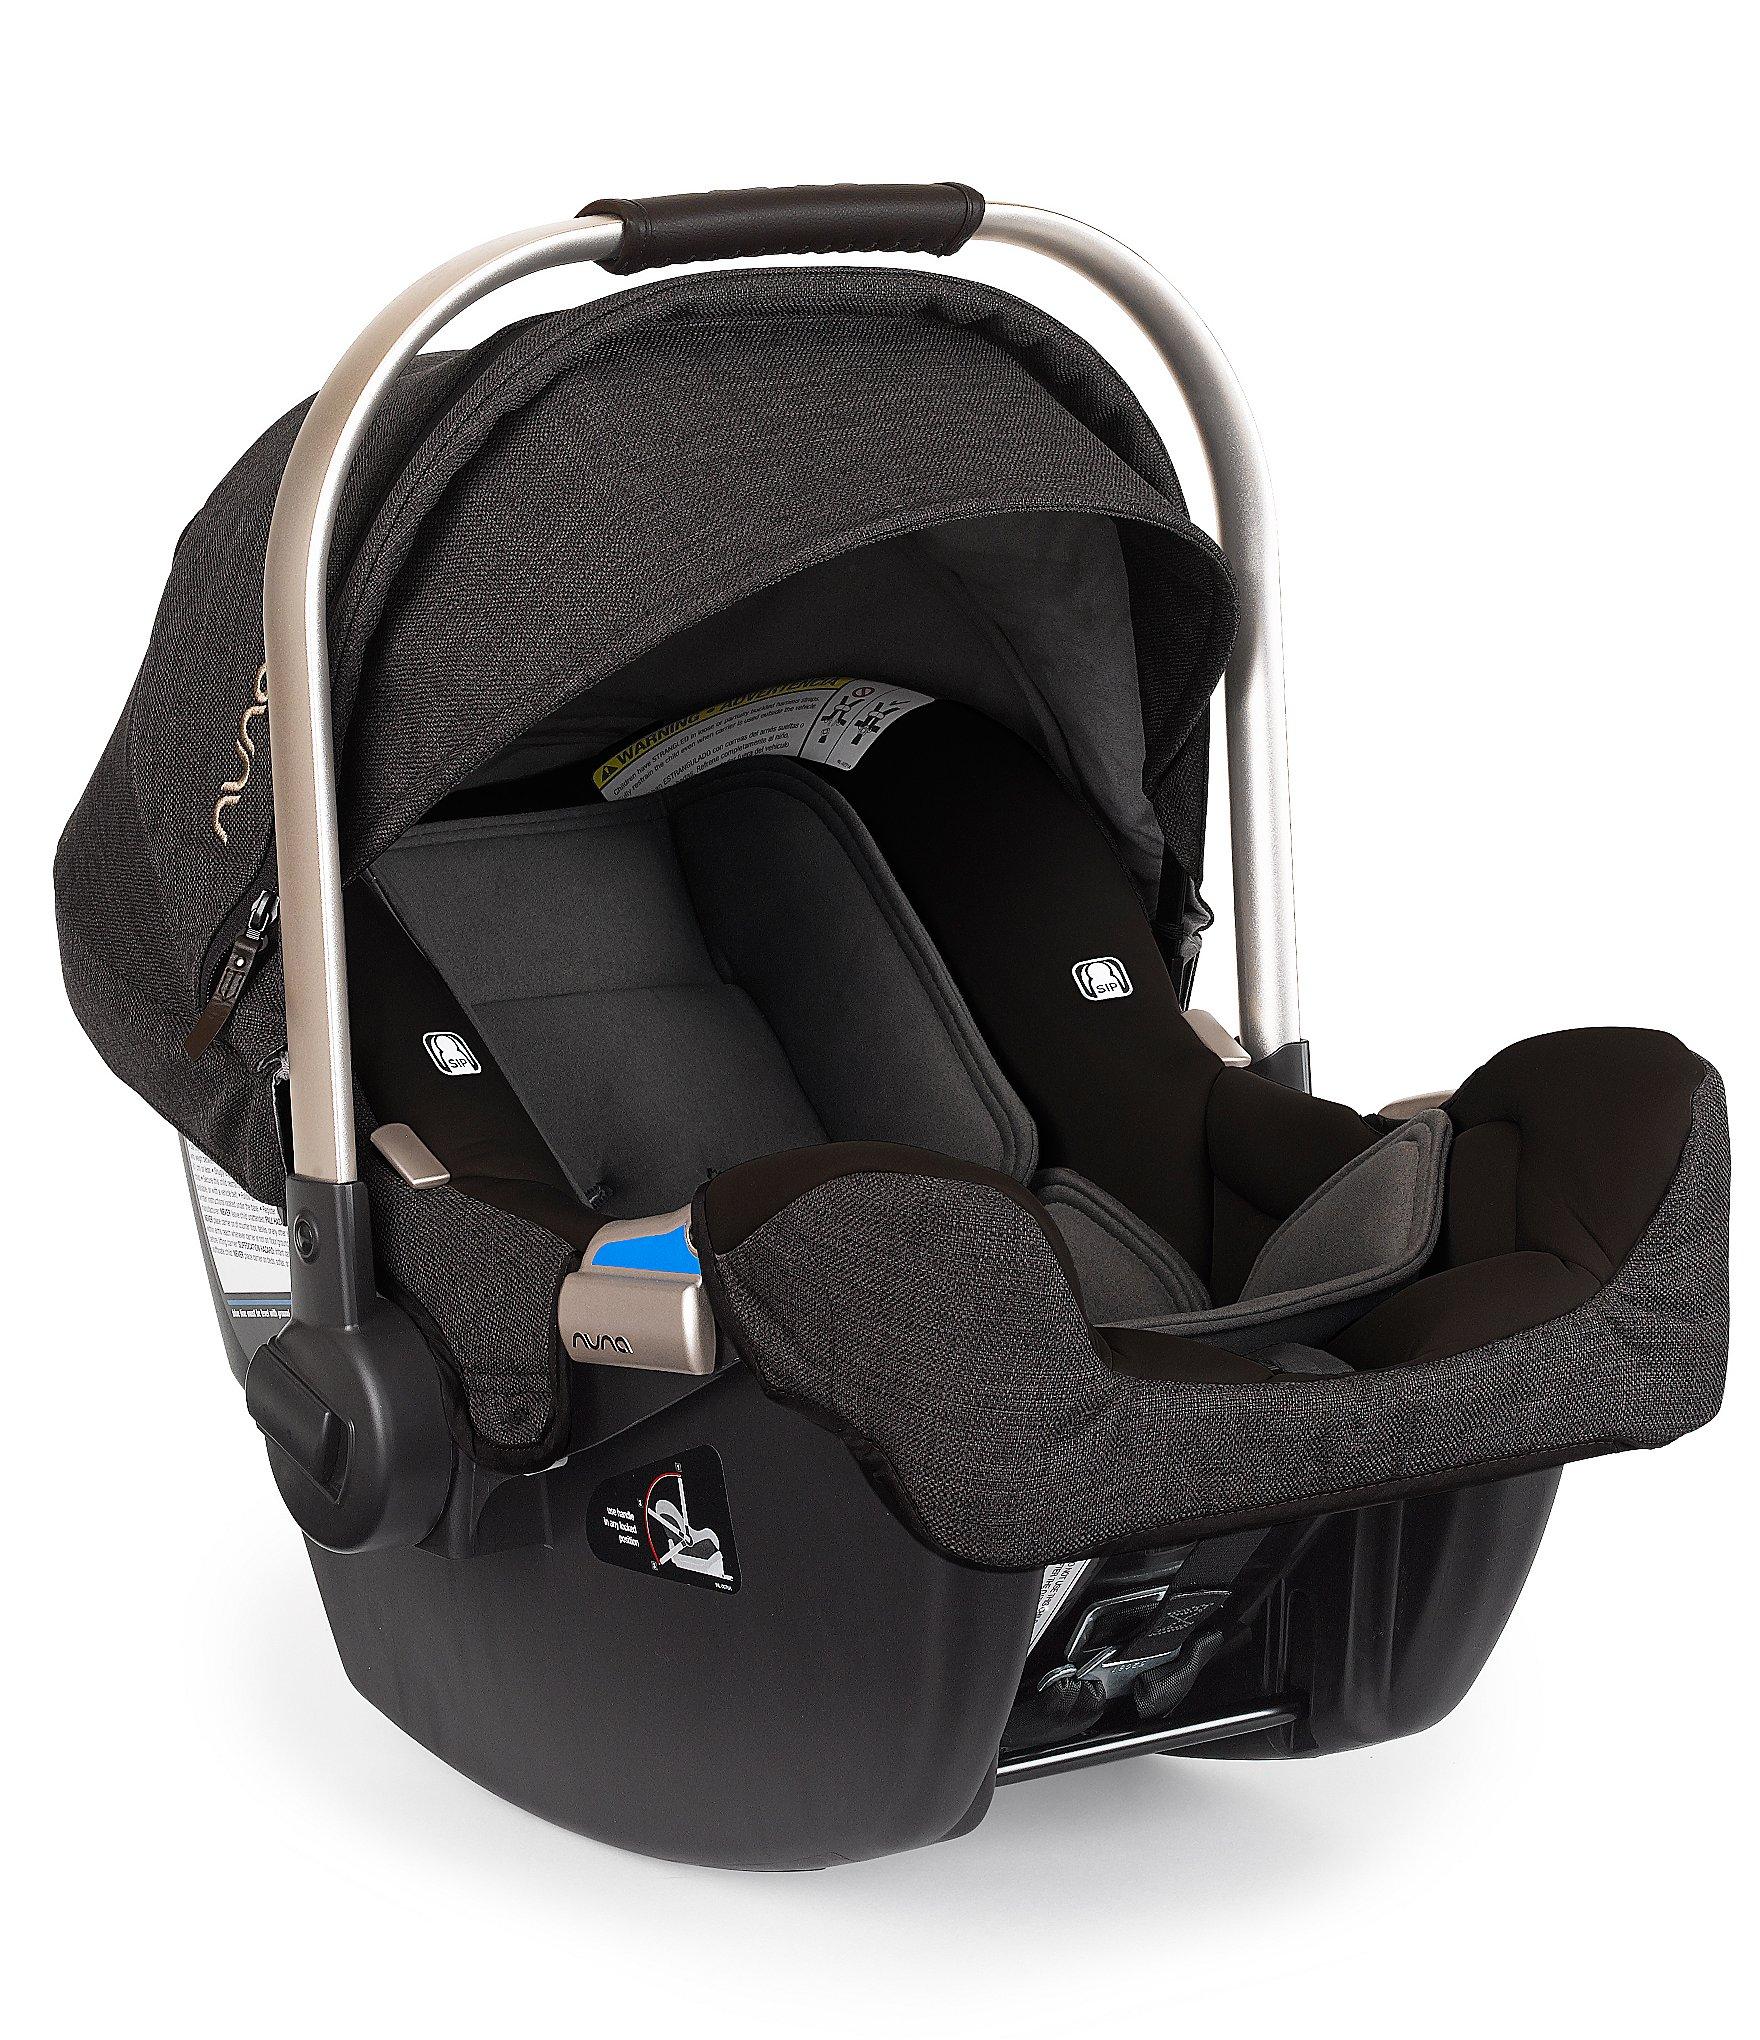 kids  baby  baby gear  car seats  dillardscom -